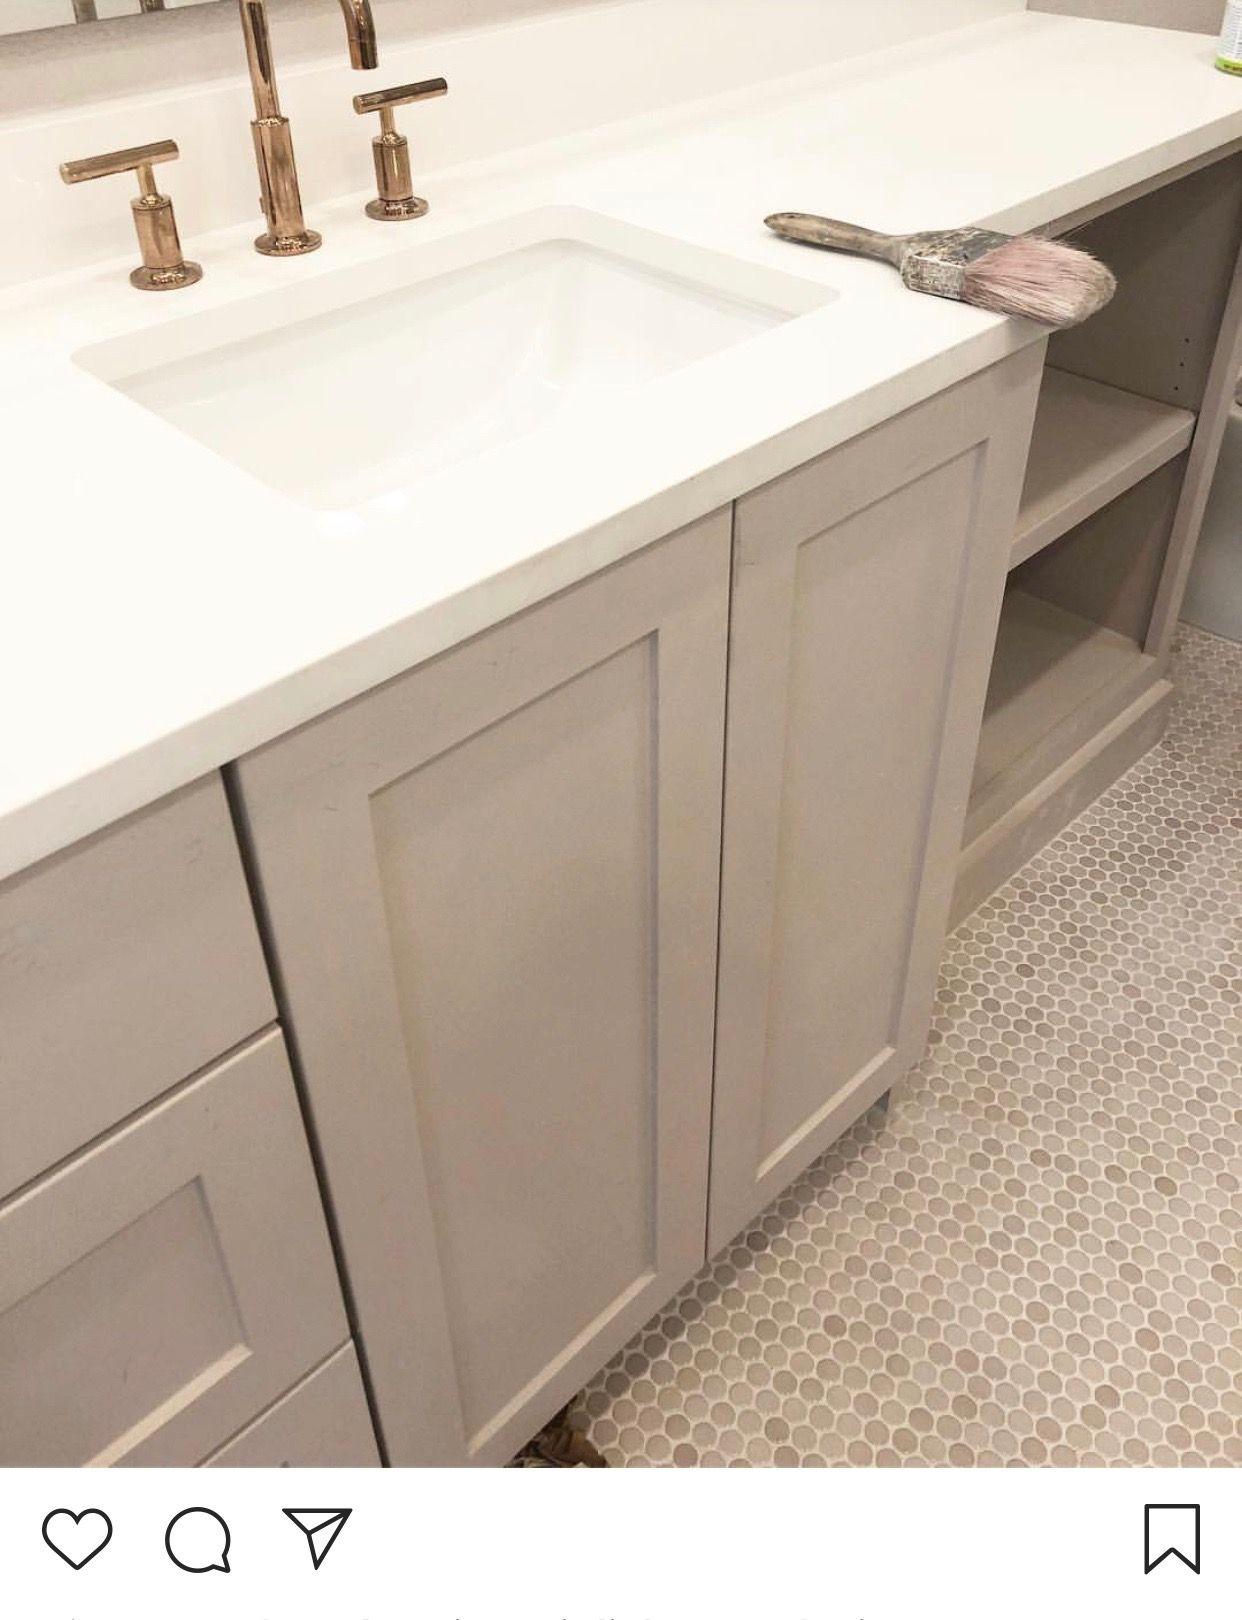 Floor cab and gold combo | Vanity, Bathroom, Bathroom vanity